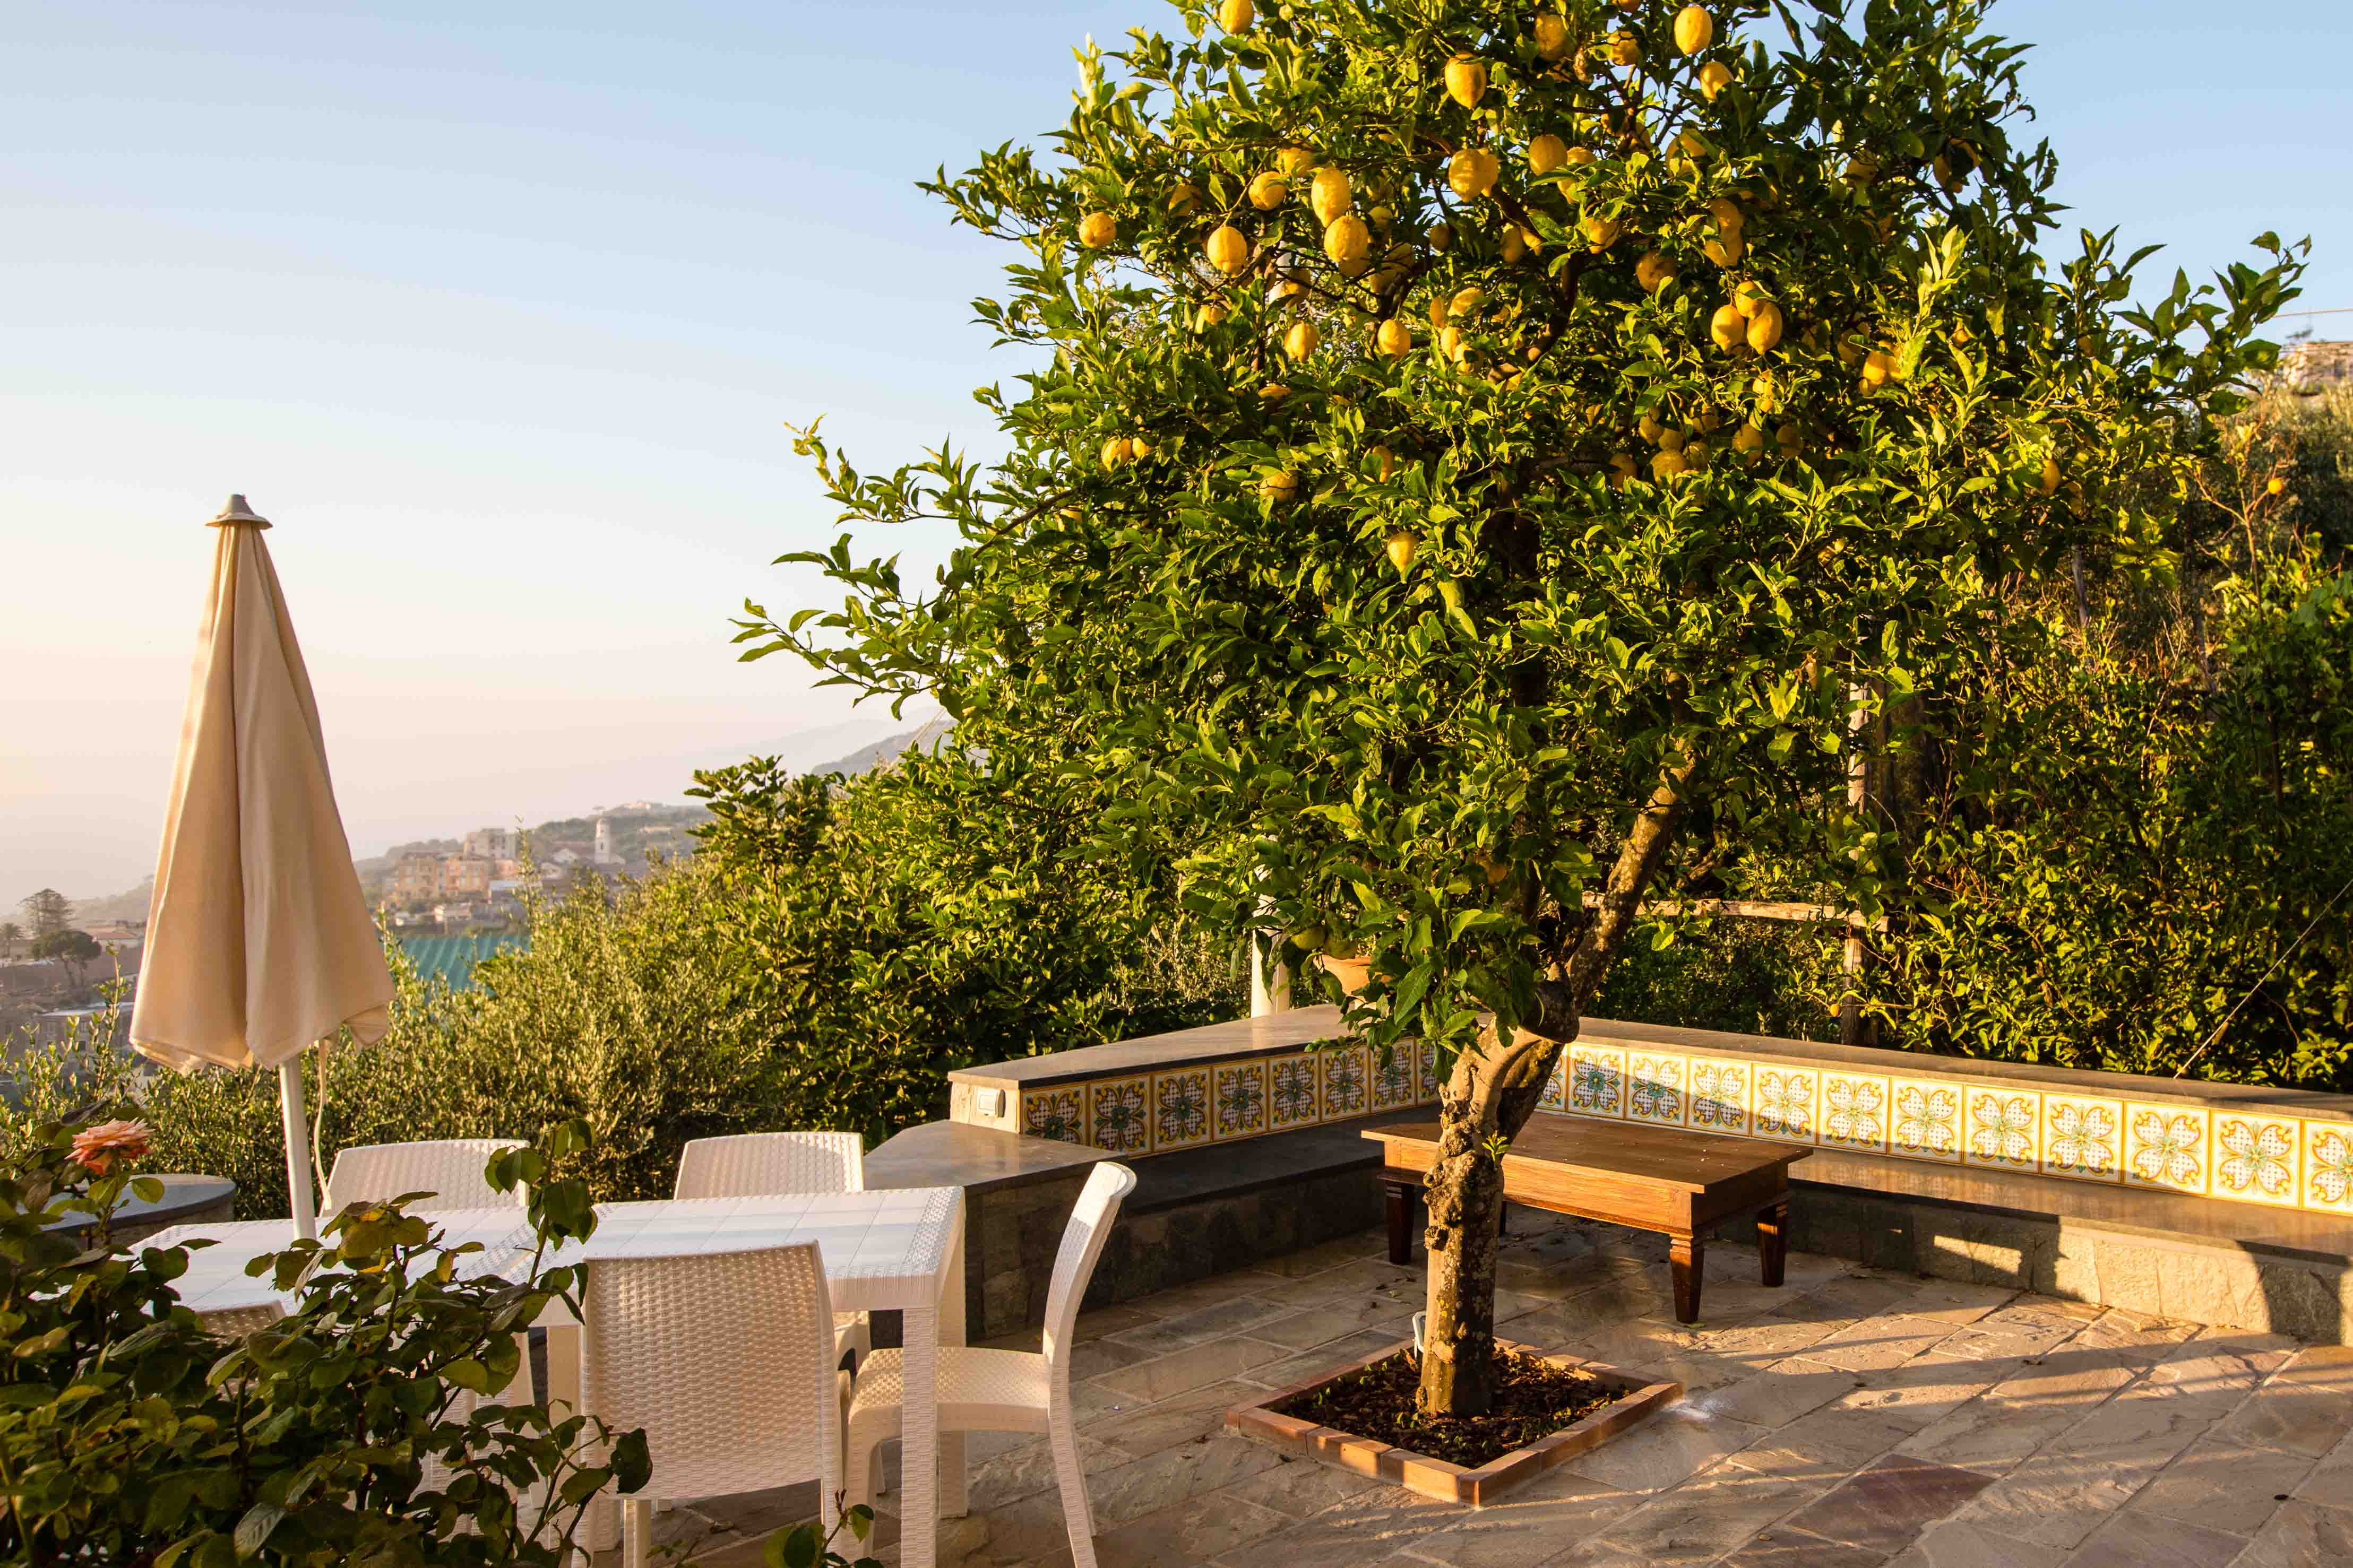 The Garden – Antonio Massa Lubrense